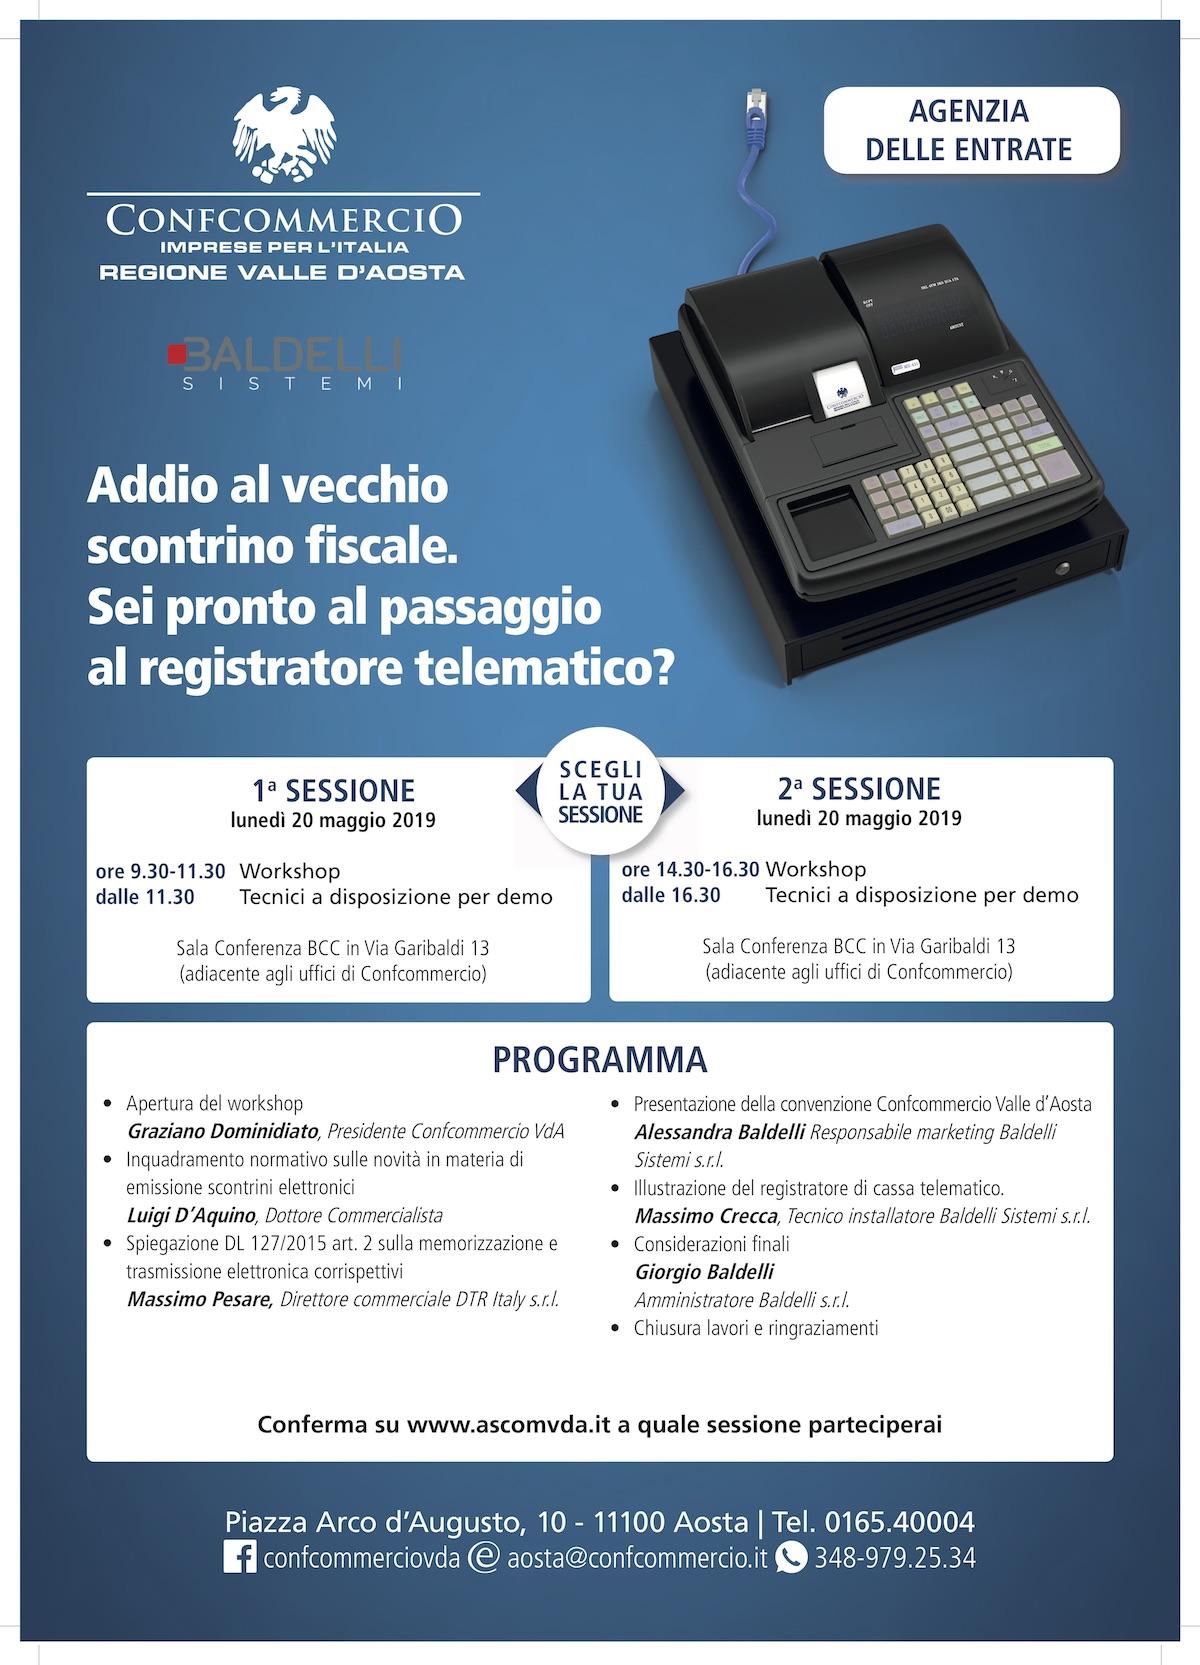 Flyer Evento Confcommercio Ufficiale